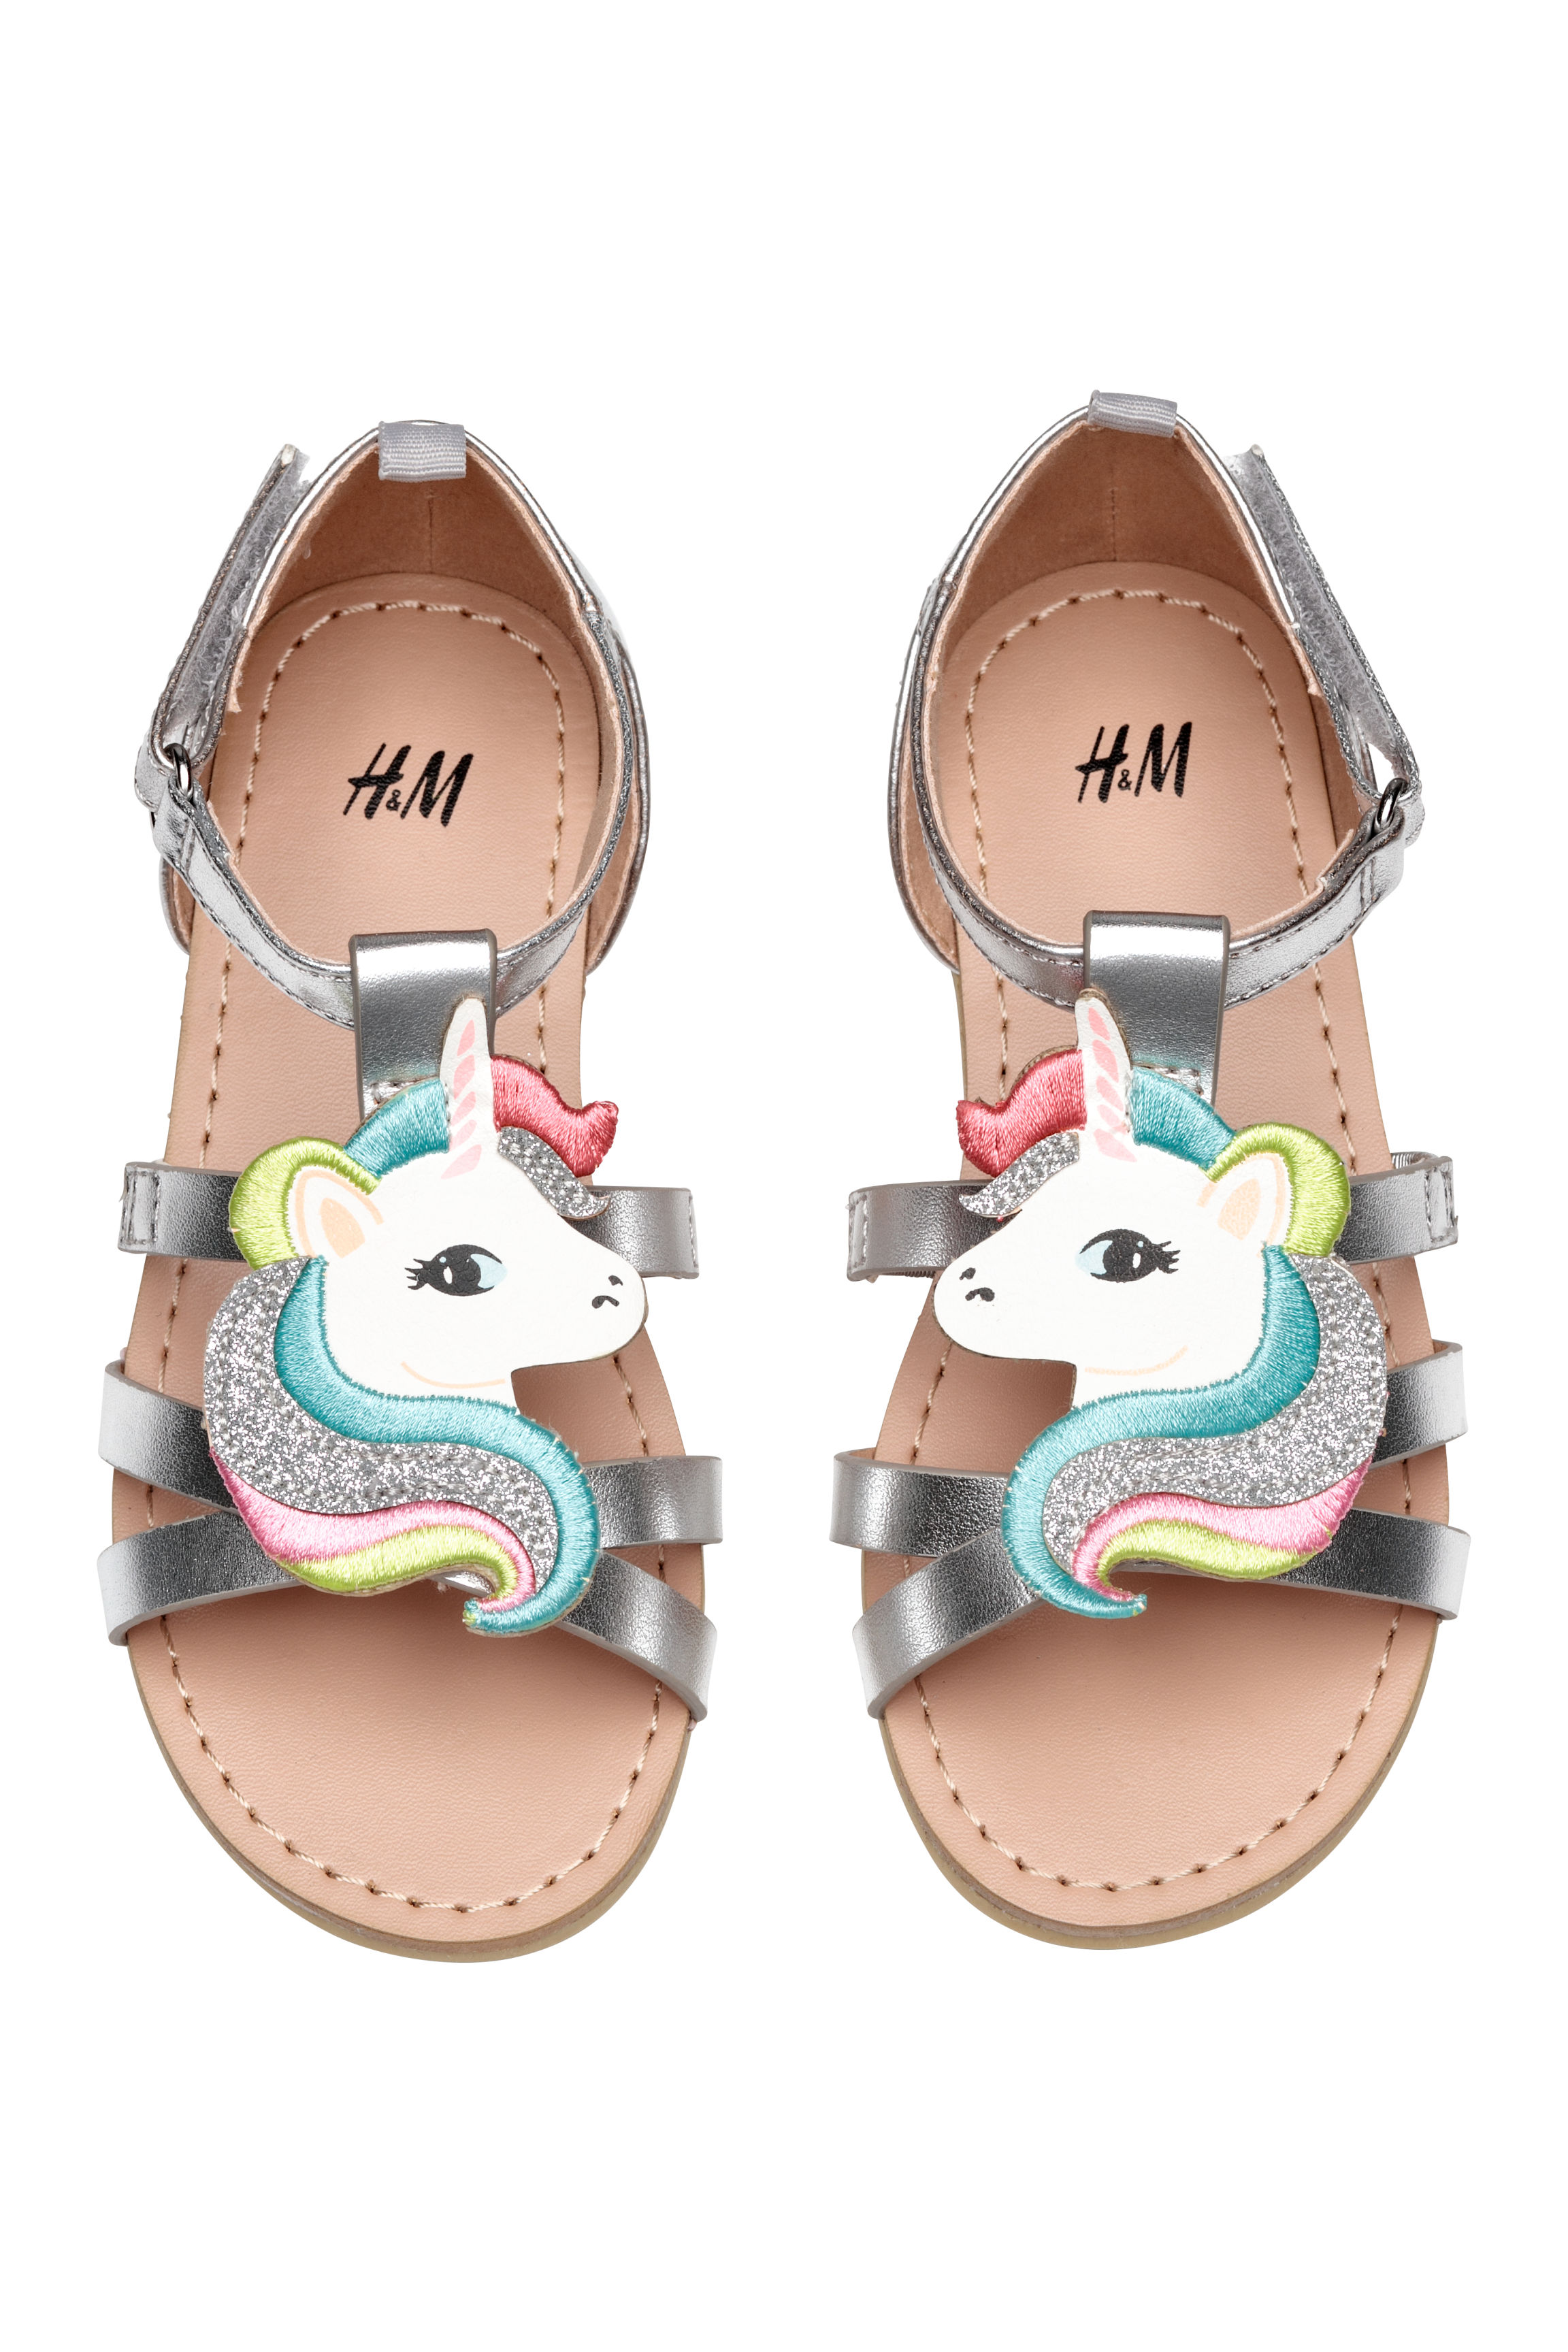 bff990737c7da Appliquéd sandals